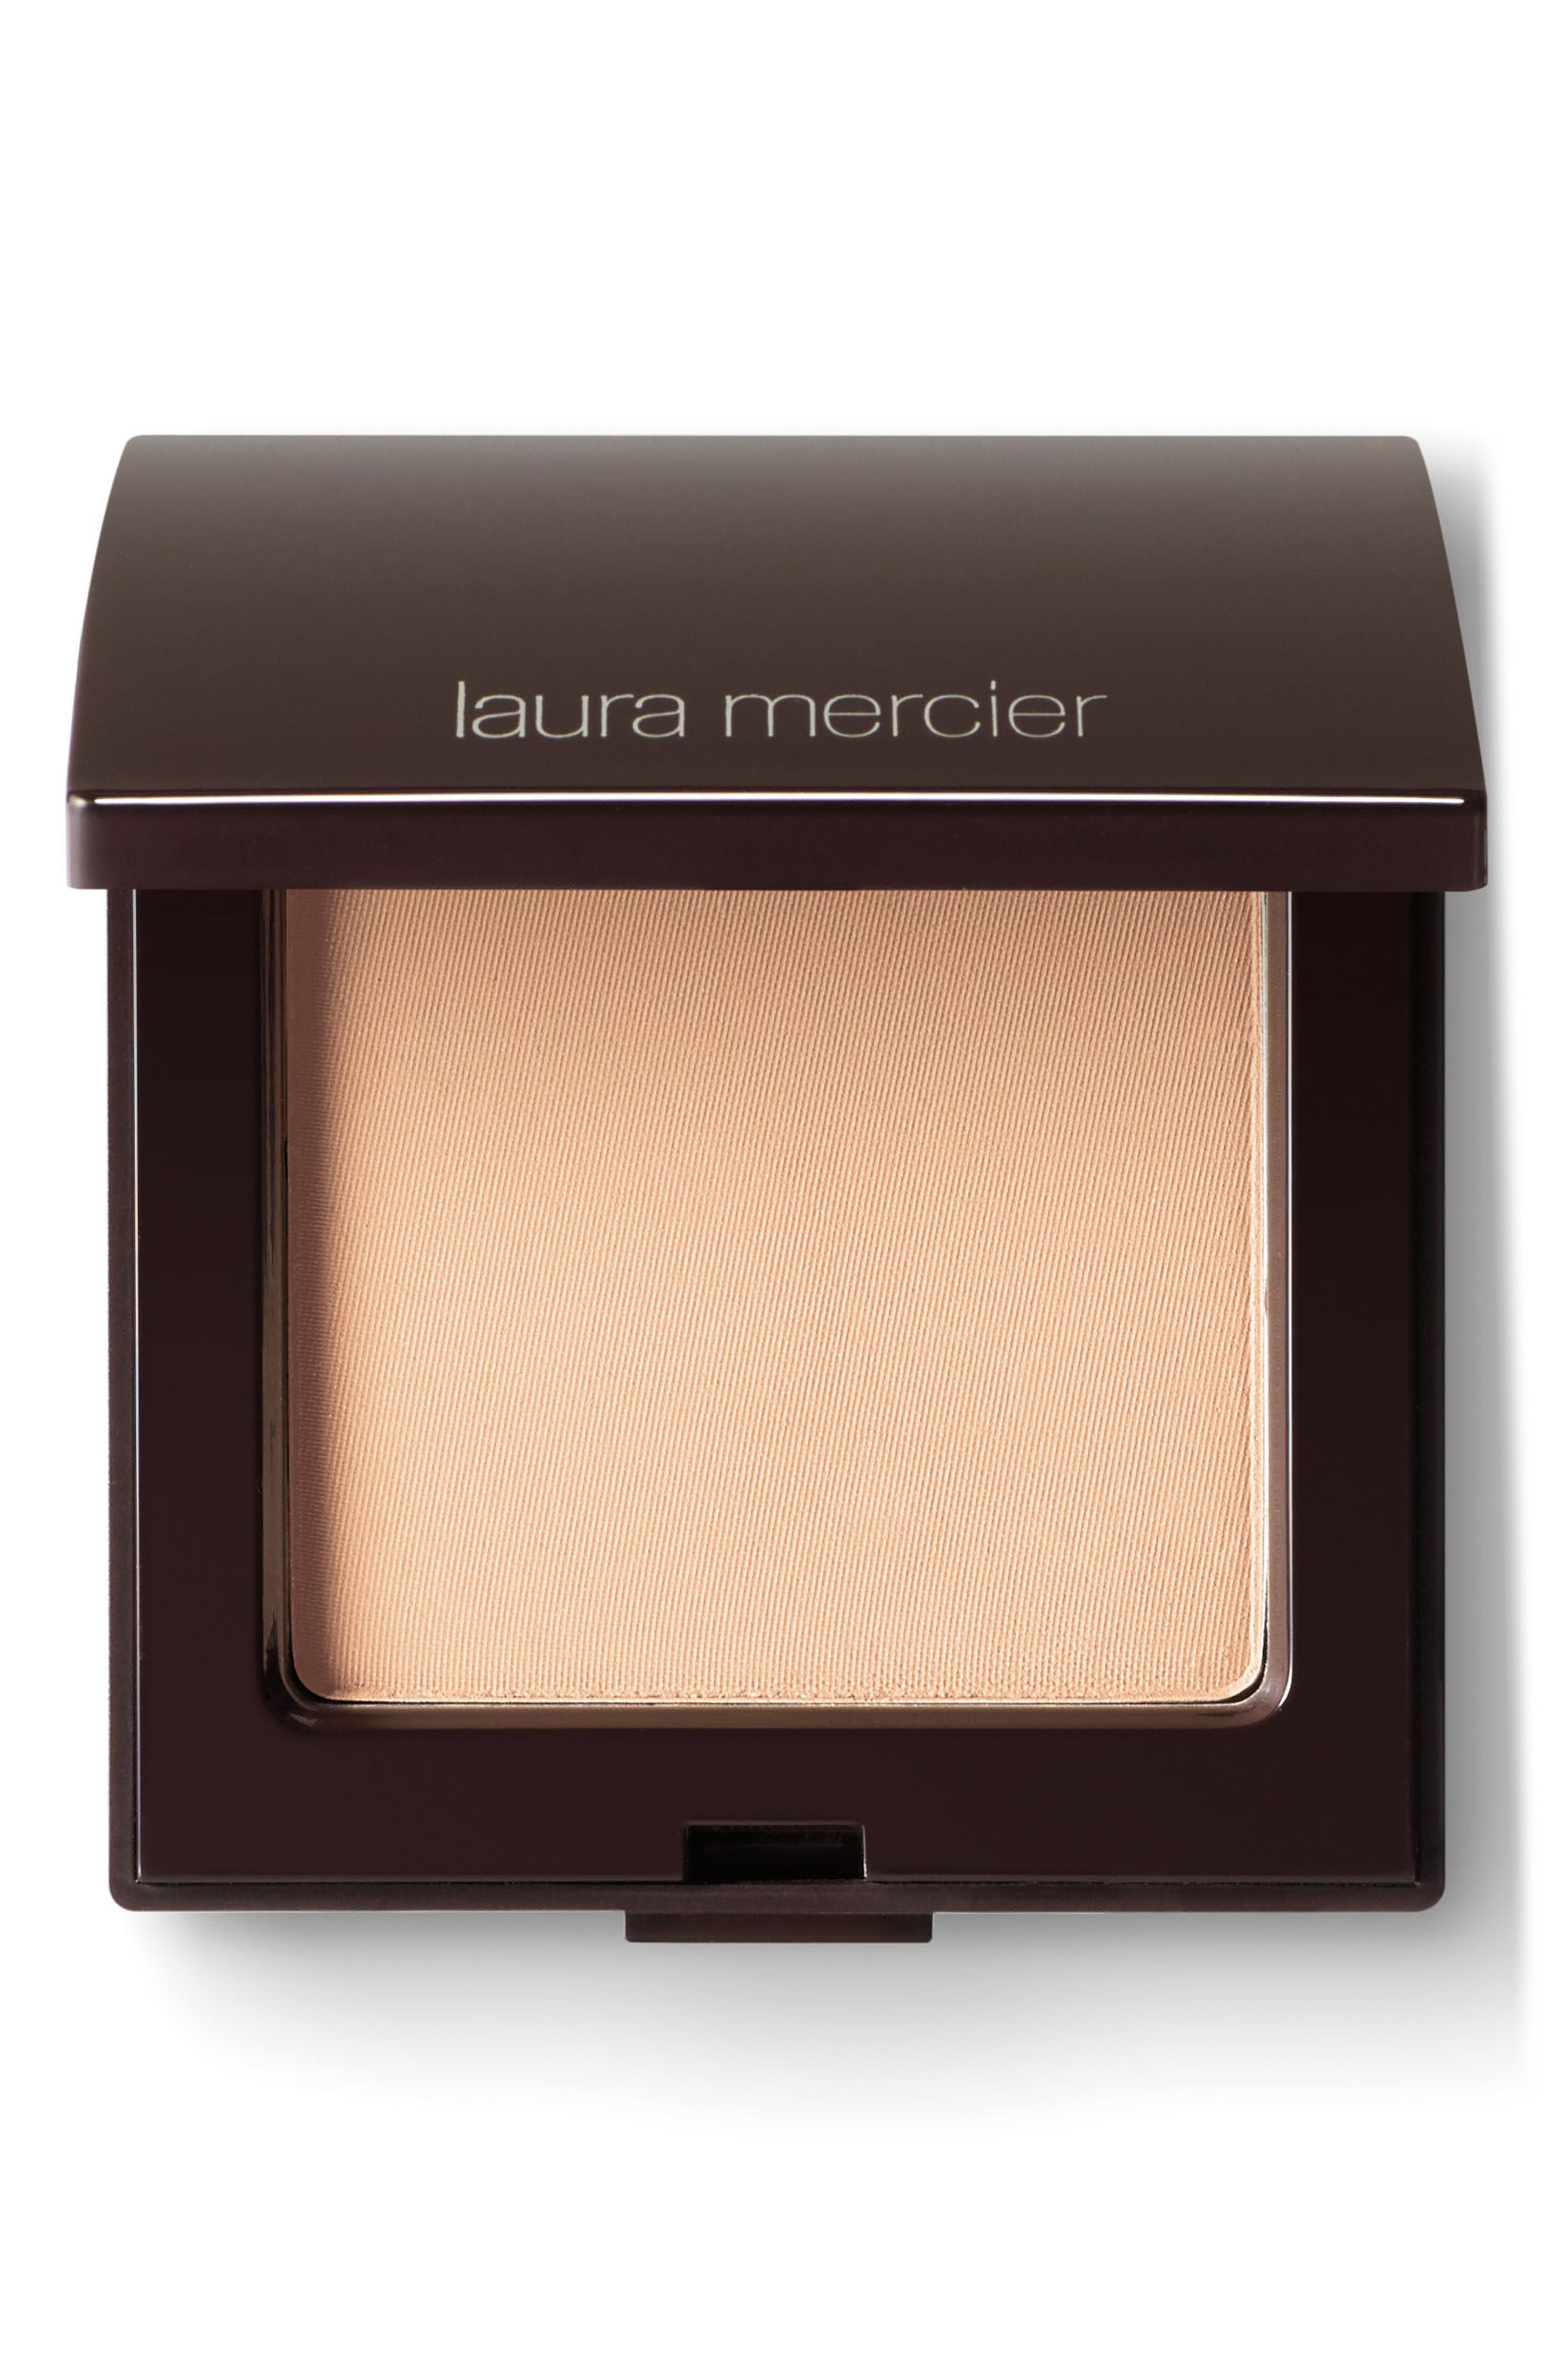 Alternate Image 1 Selected - Laura Mercier Mineral Pressed Powder